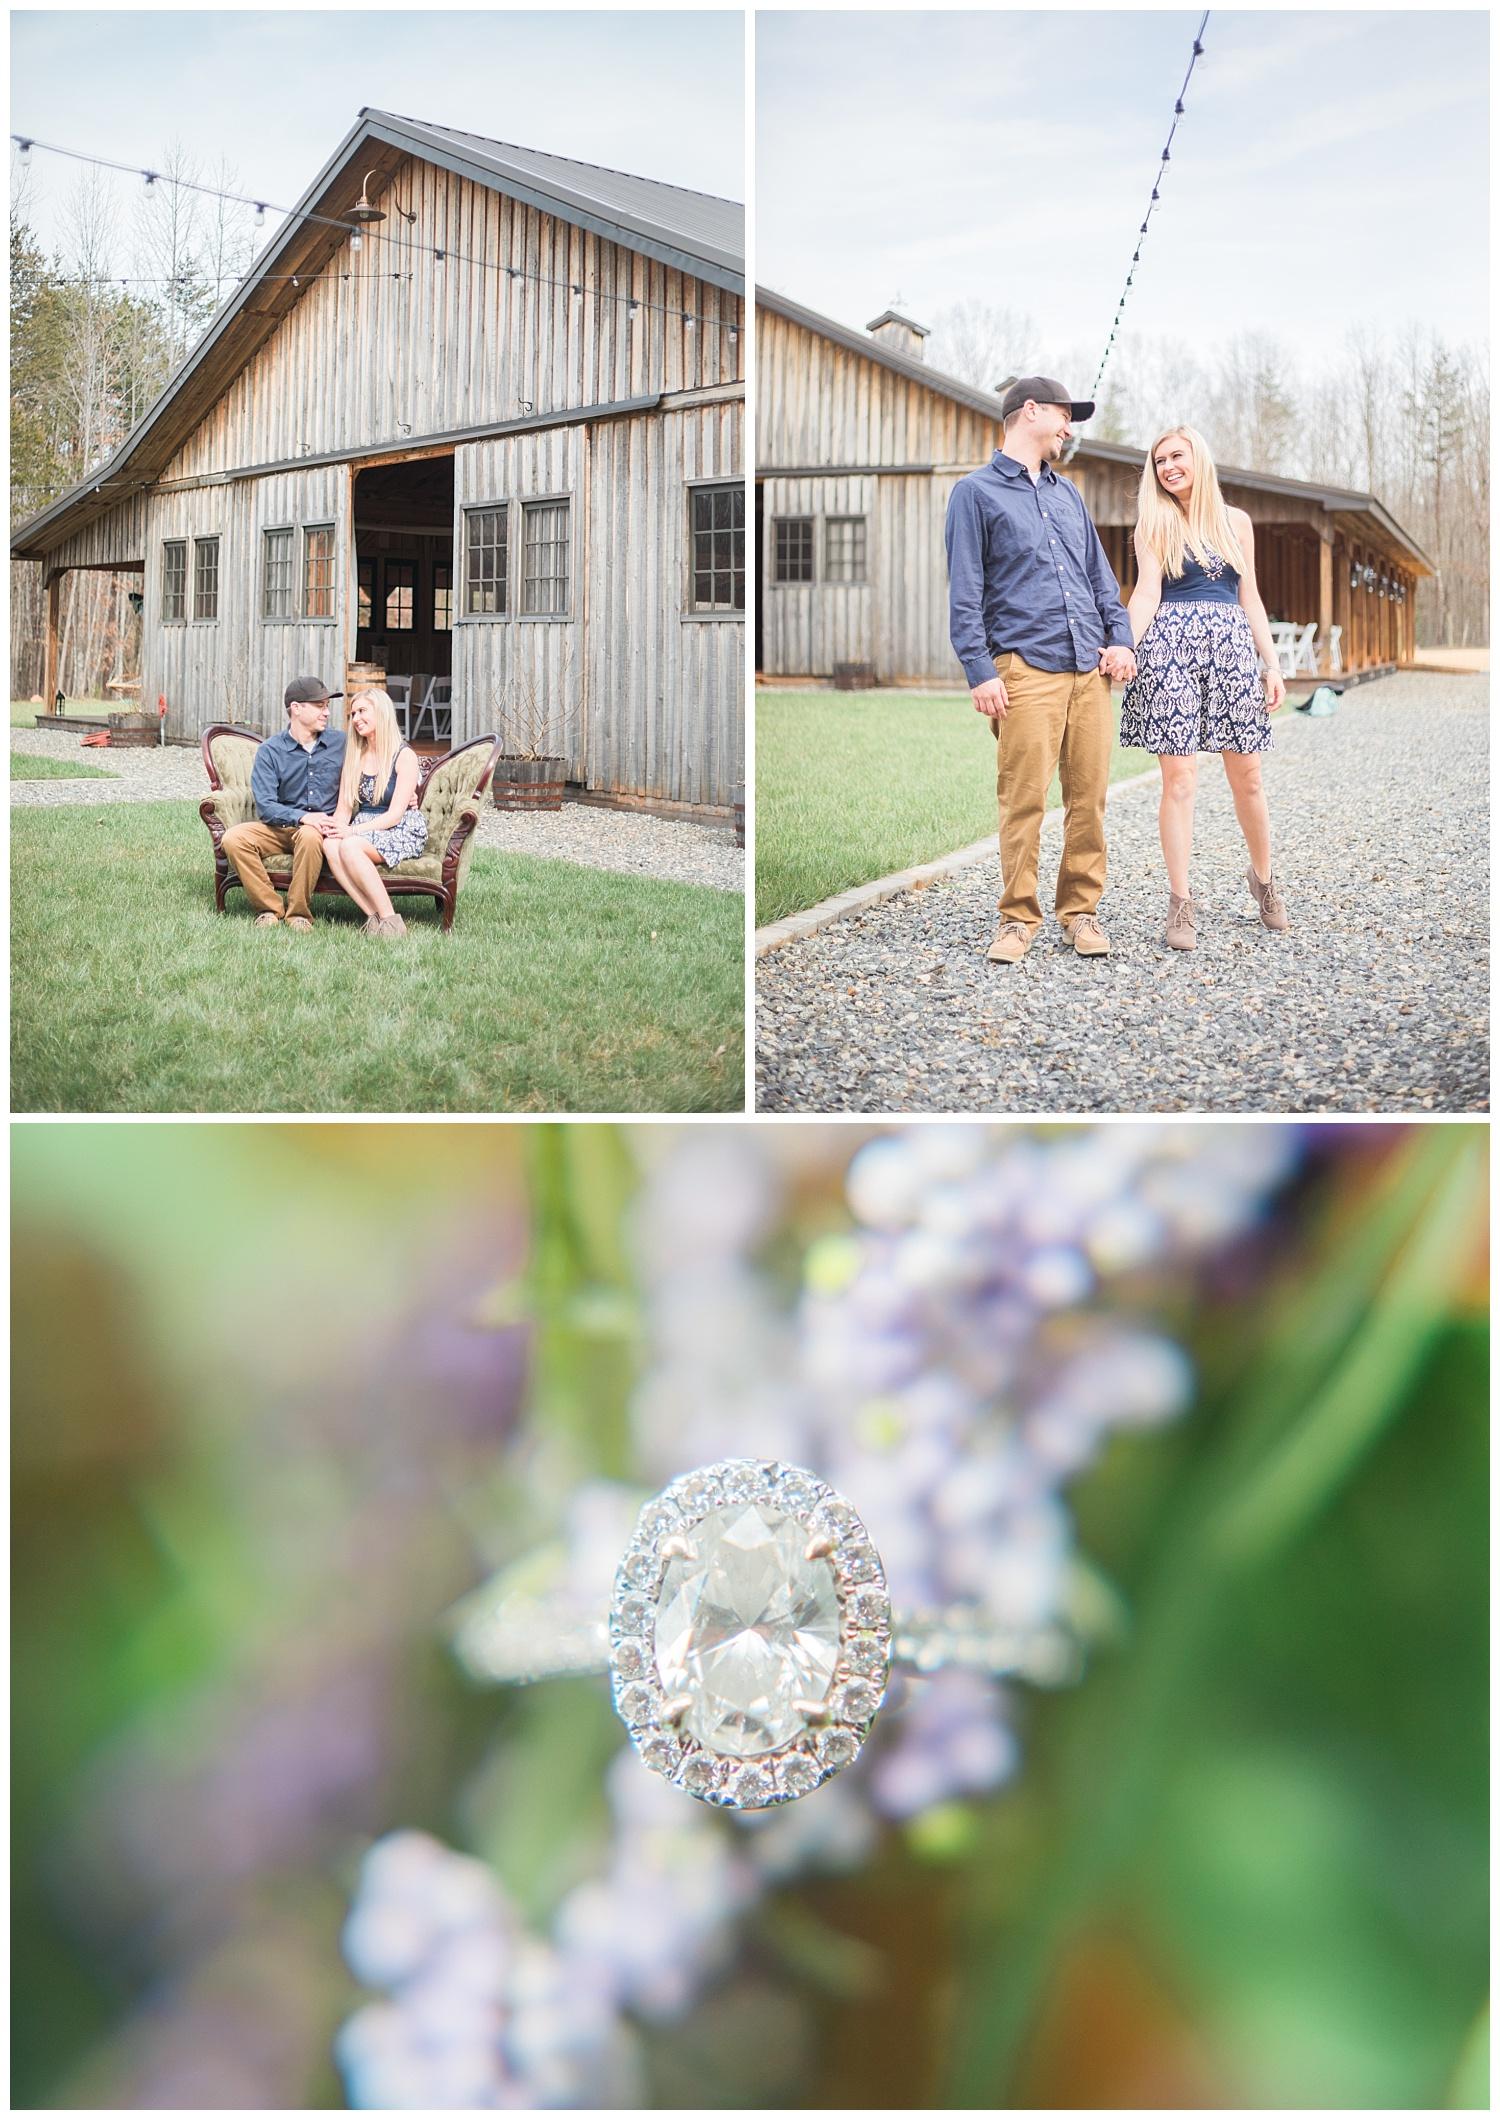 Virginia Engagement Photographer - MJ Mendoza Photography